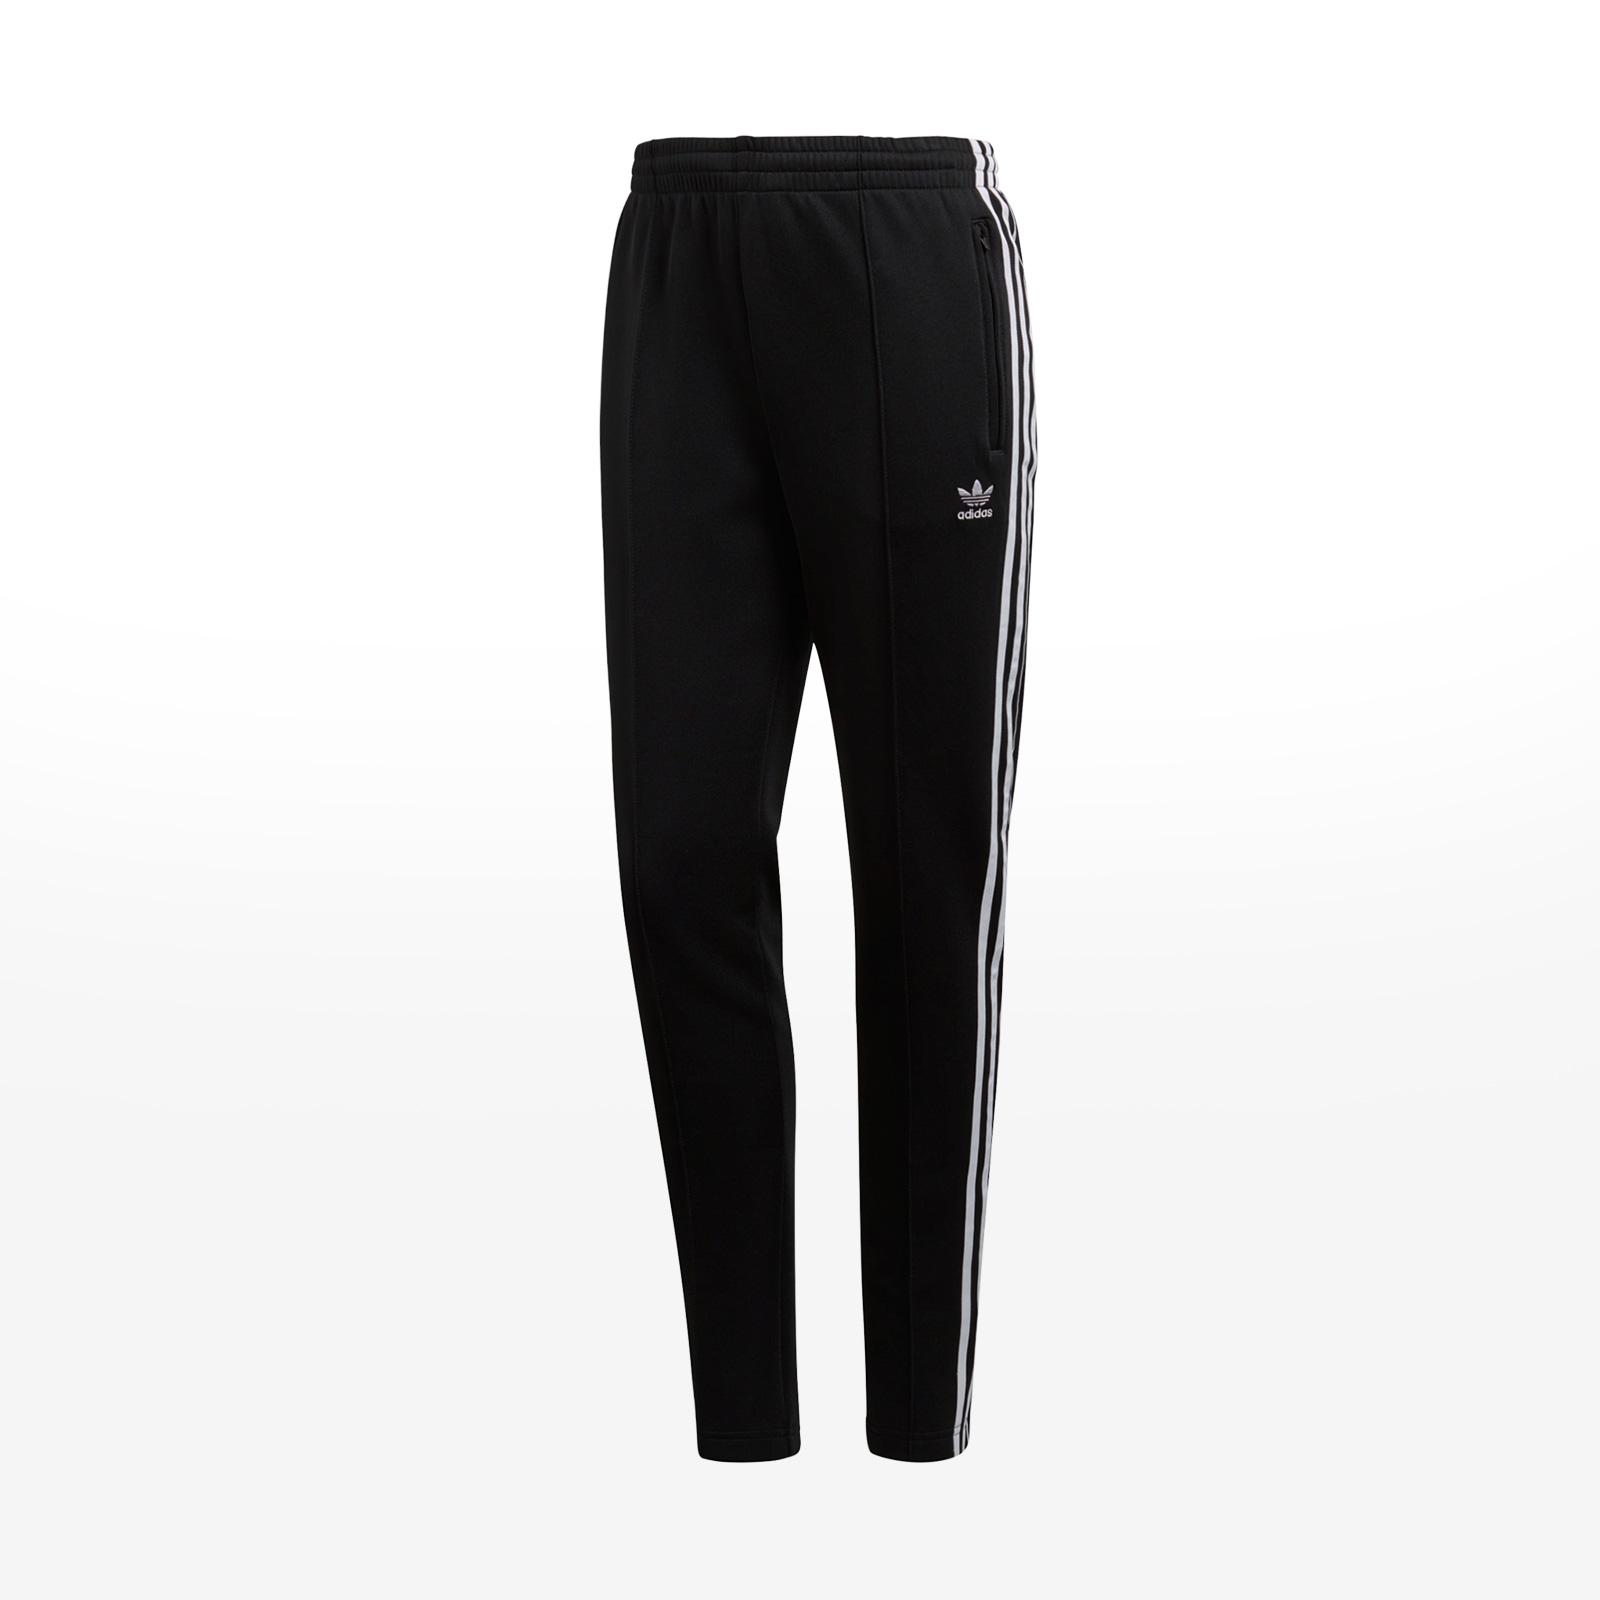 adidas Originals - SST TP - BLACK